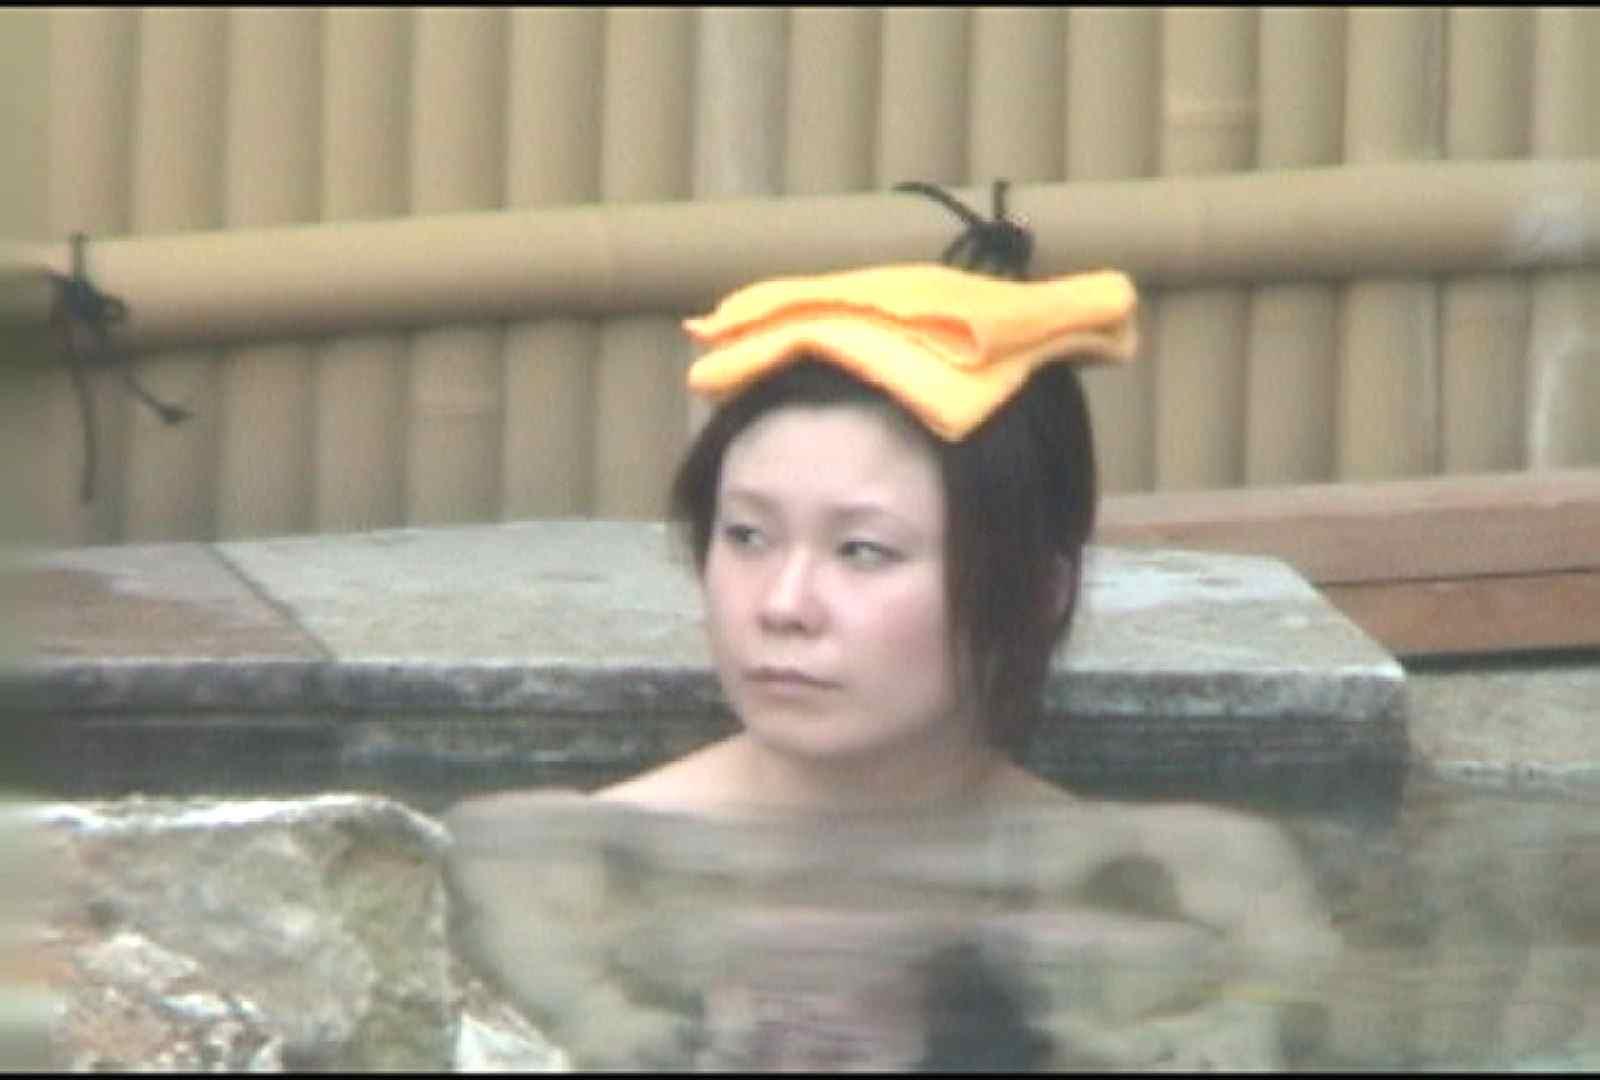 Aquaな露天風呂Vol.177 盗撮師作品  102pic 69